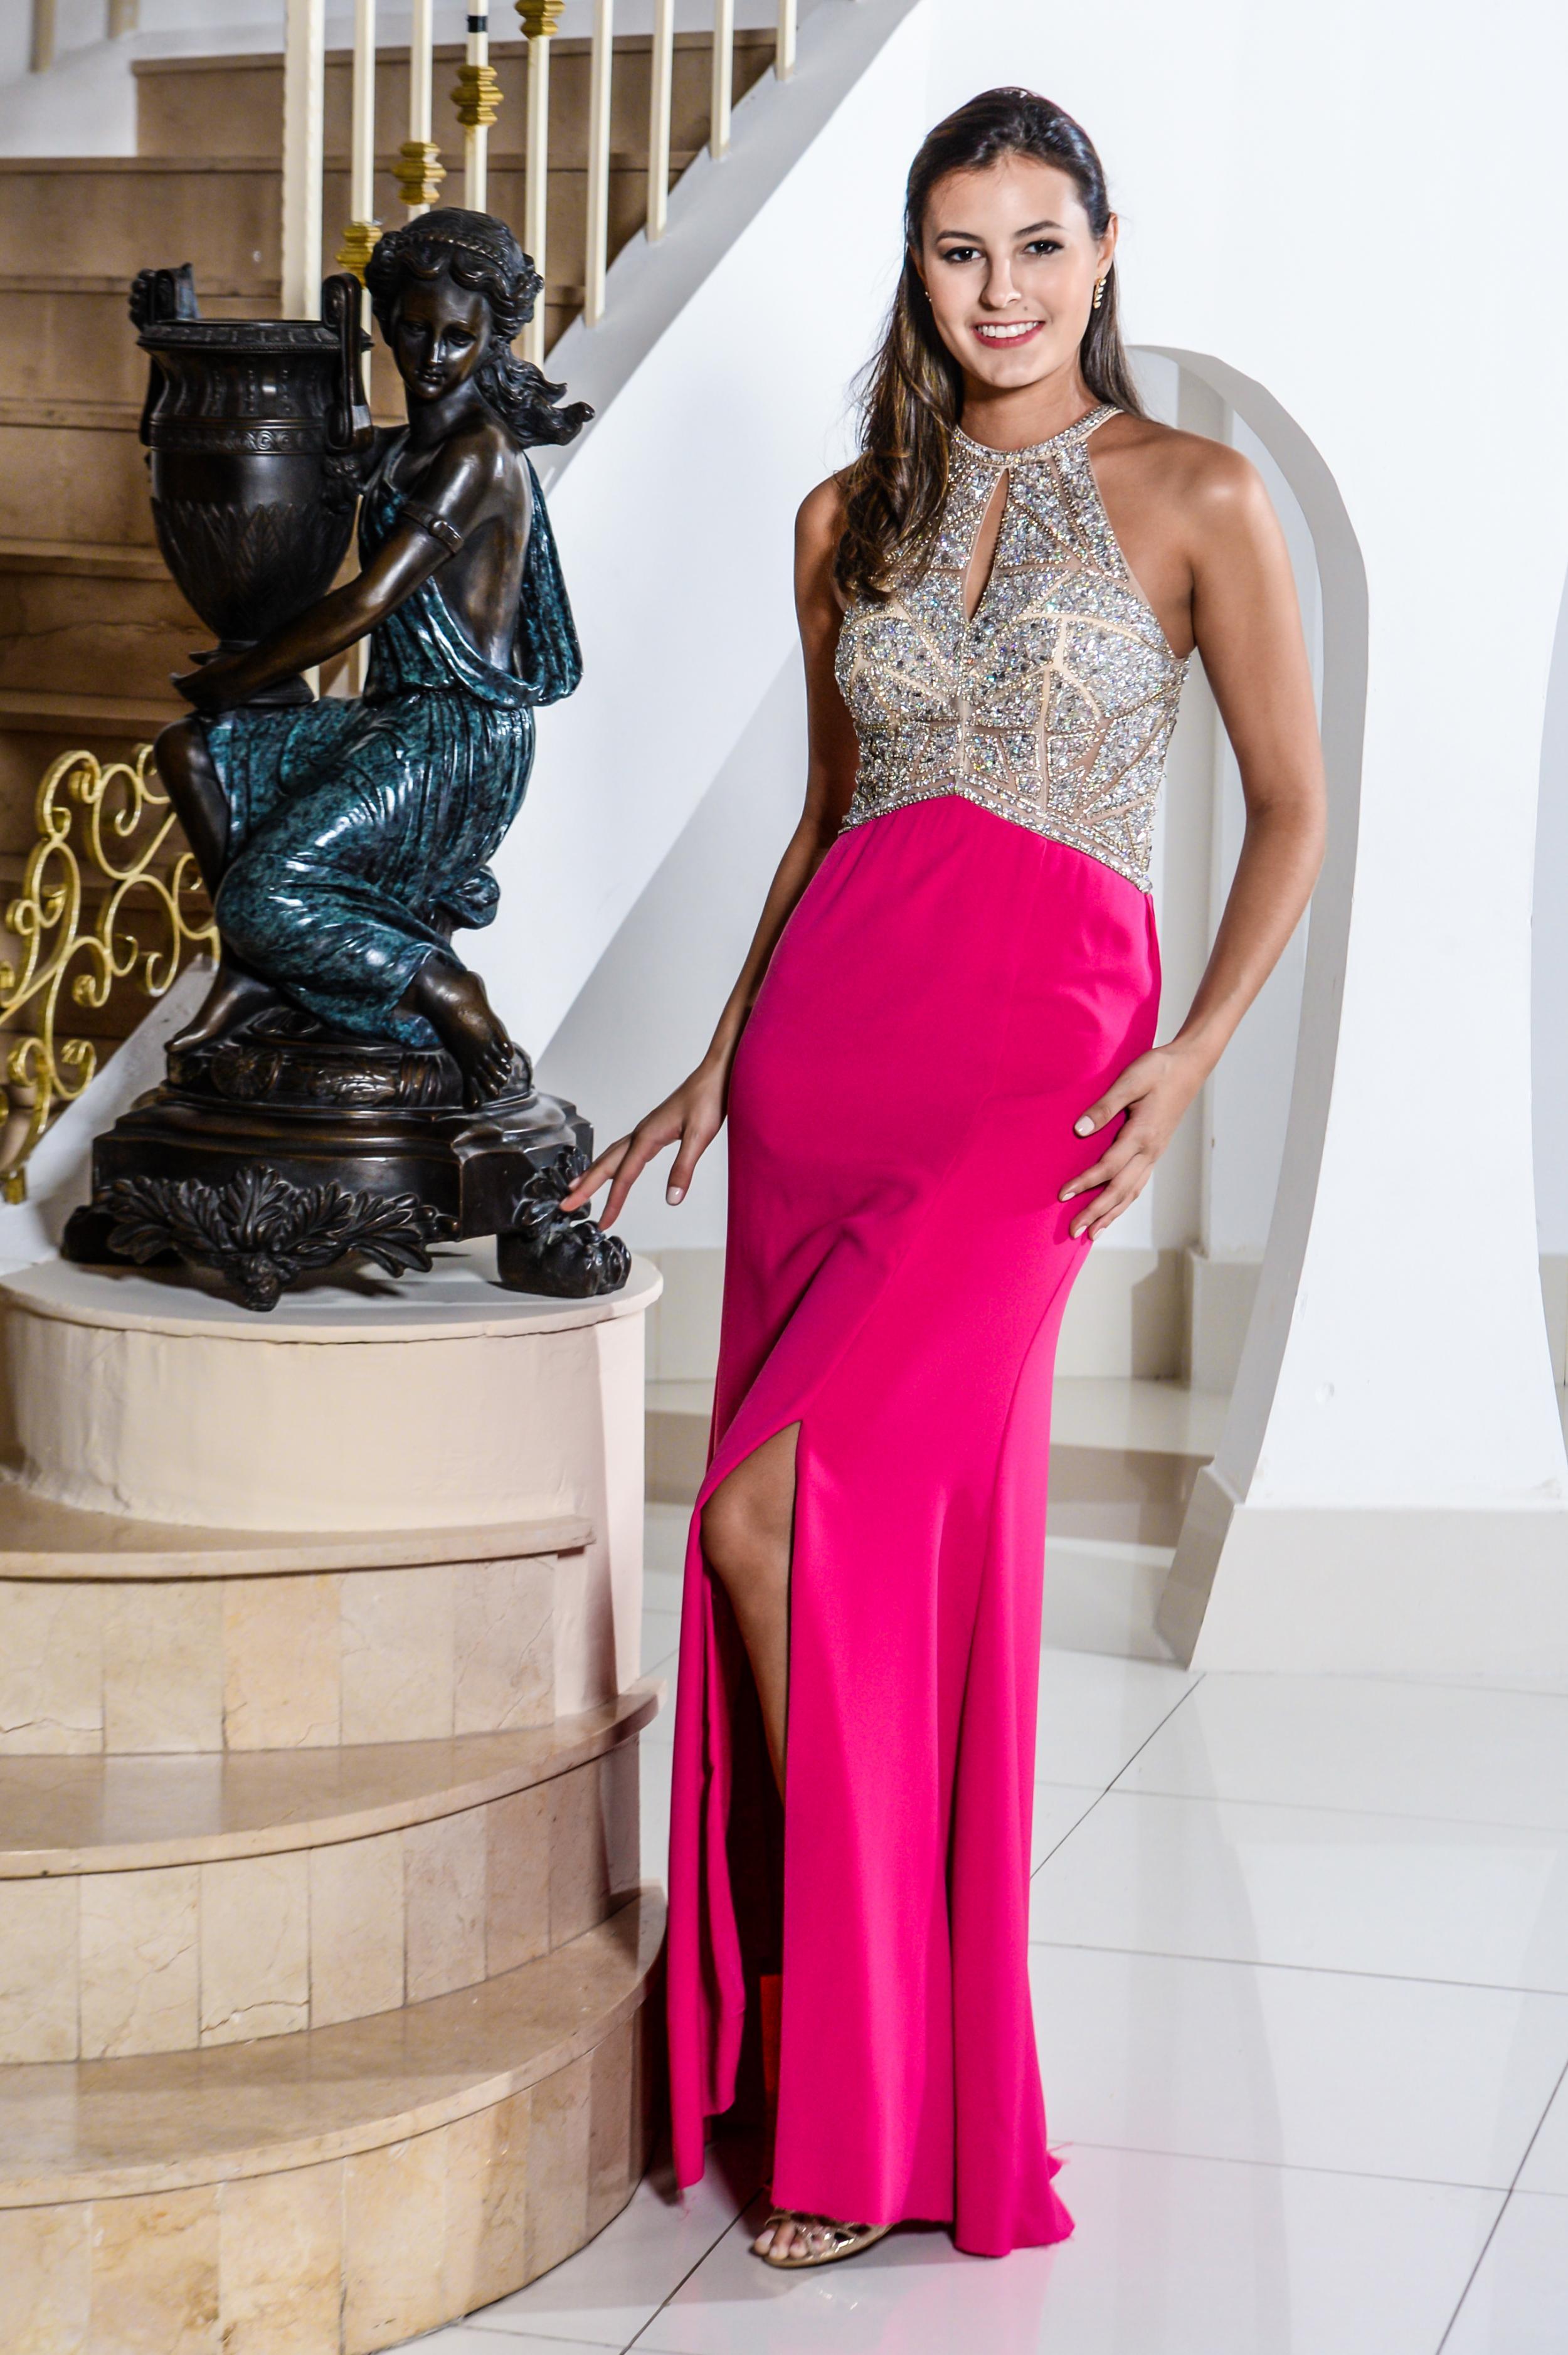 102 - Vestido pink corpo bordado em prata saia removível